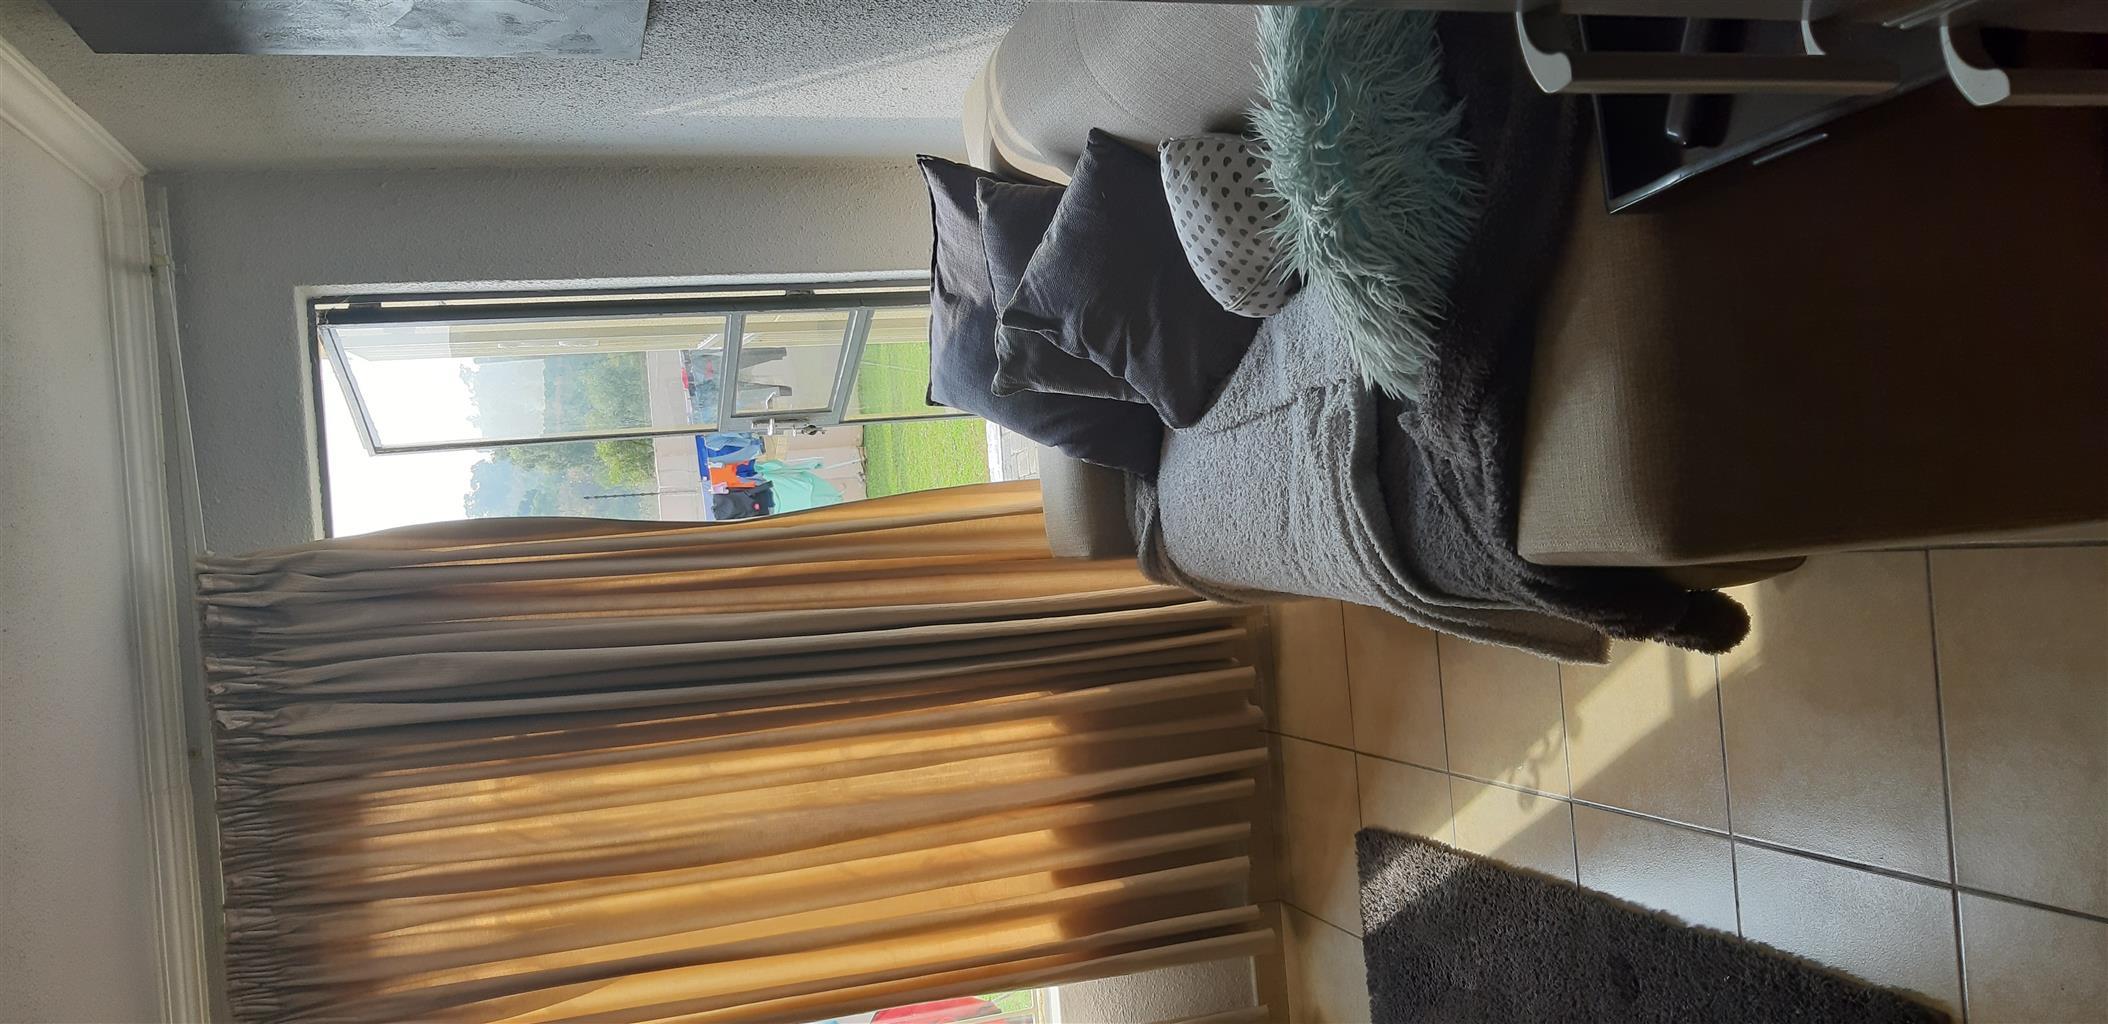 Coricraft big couch